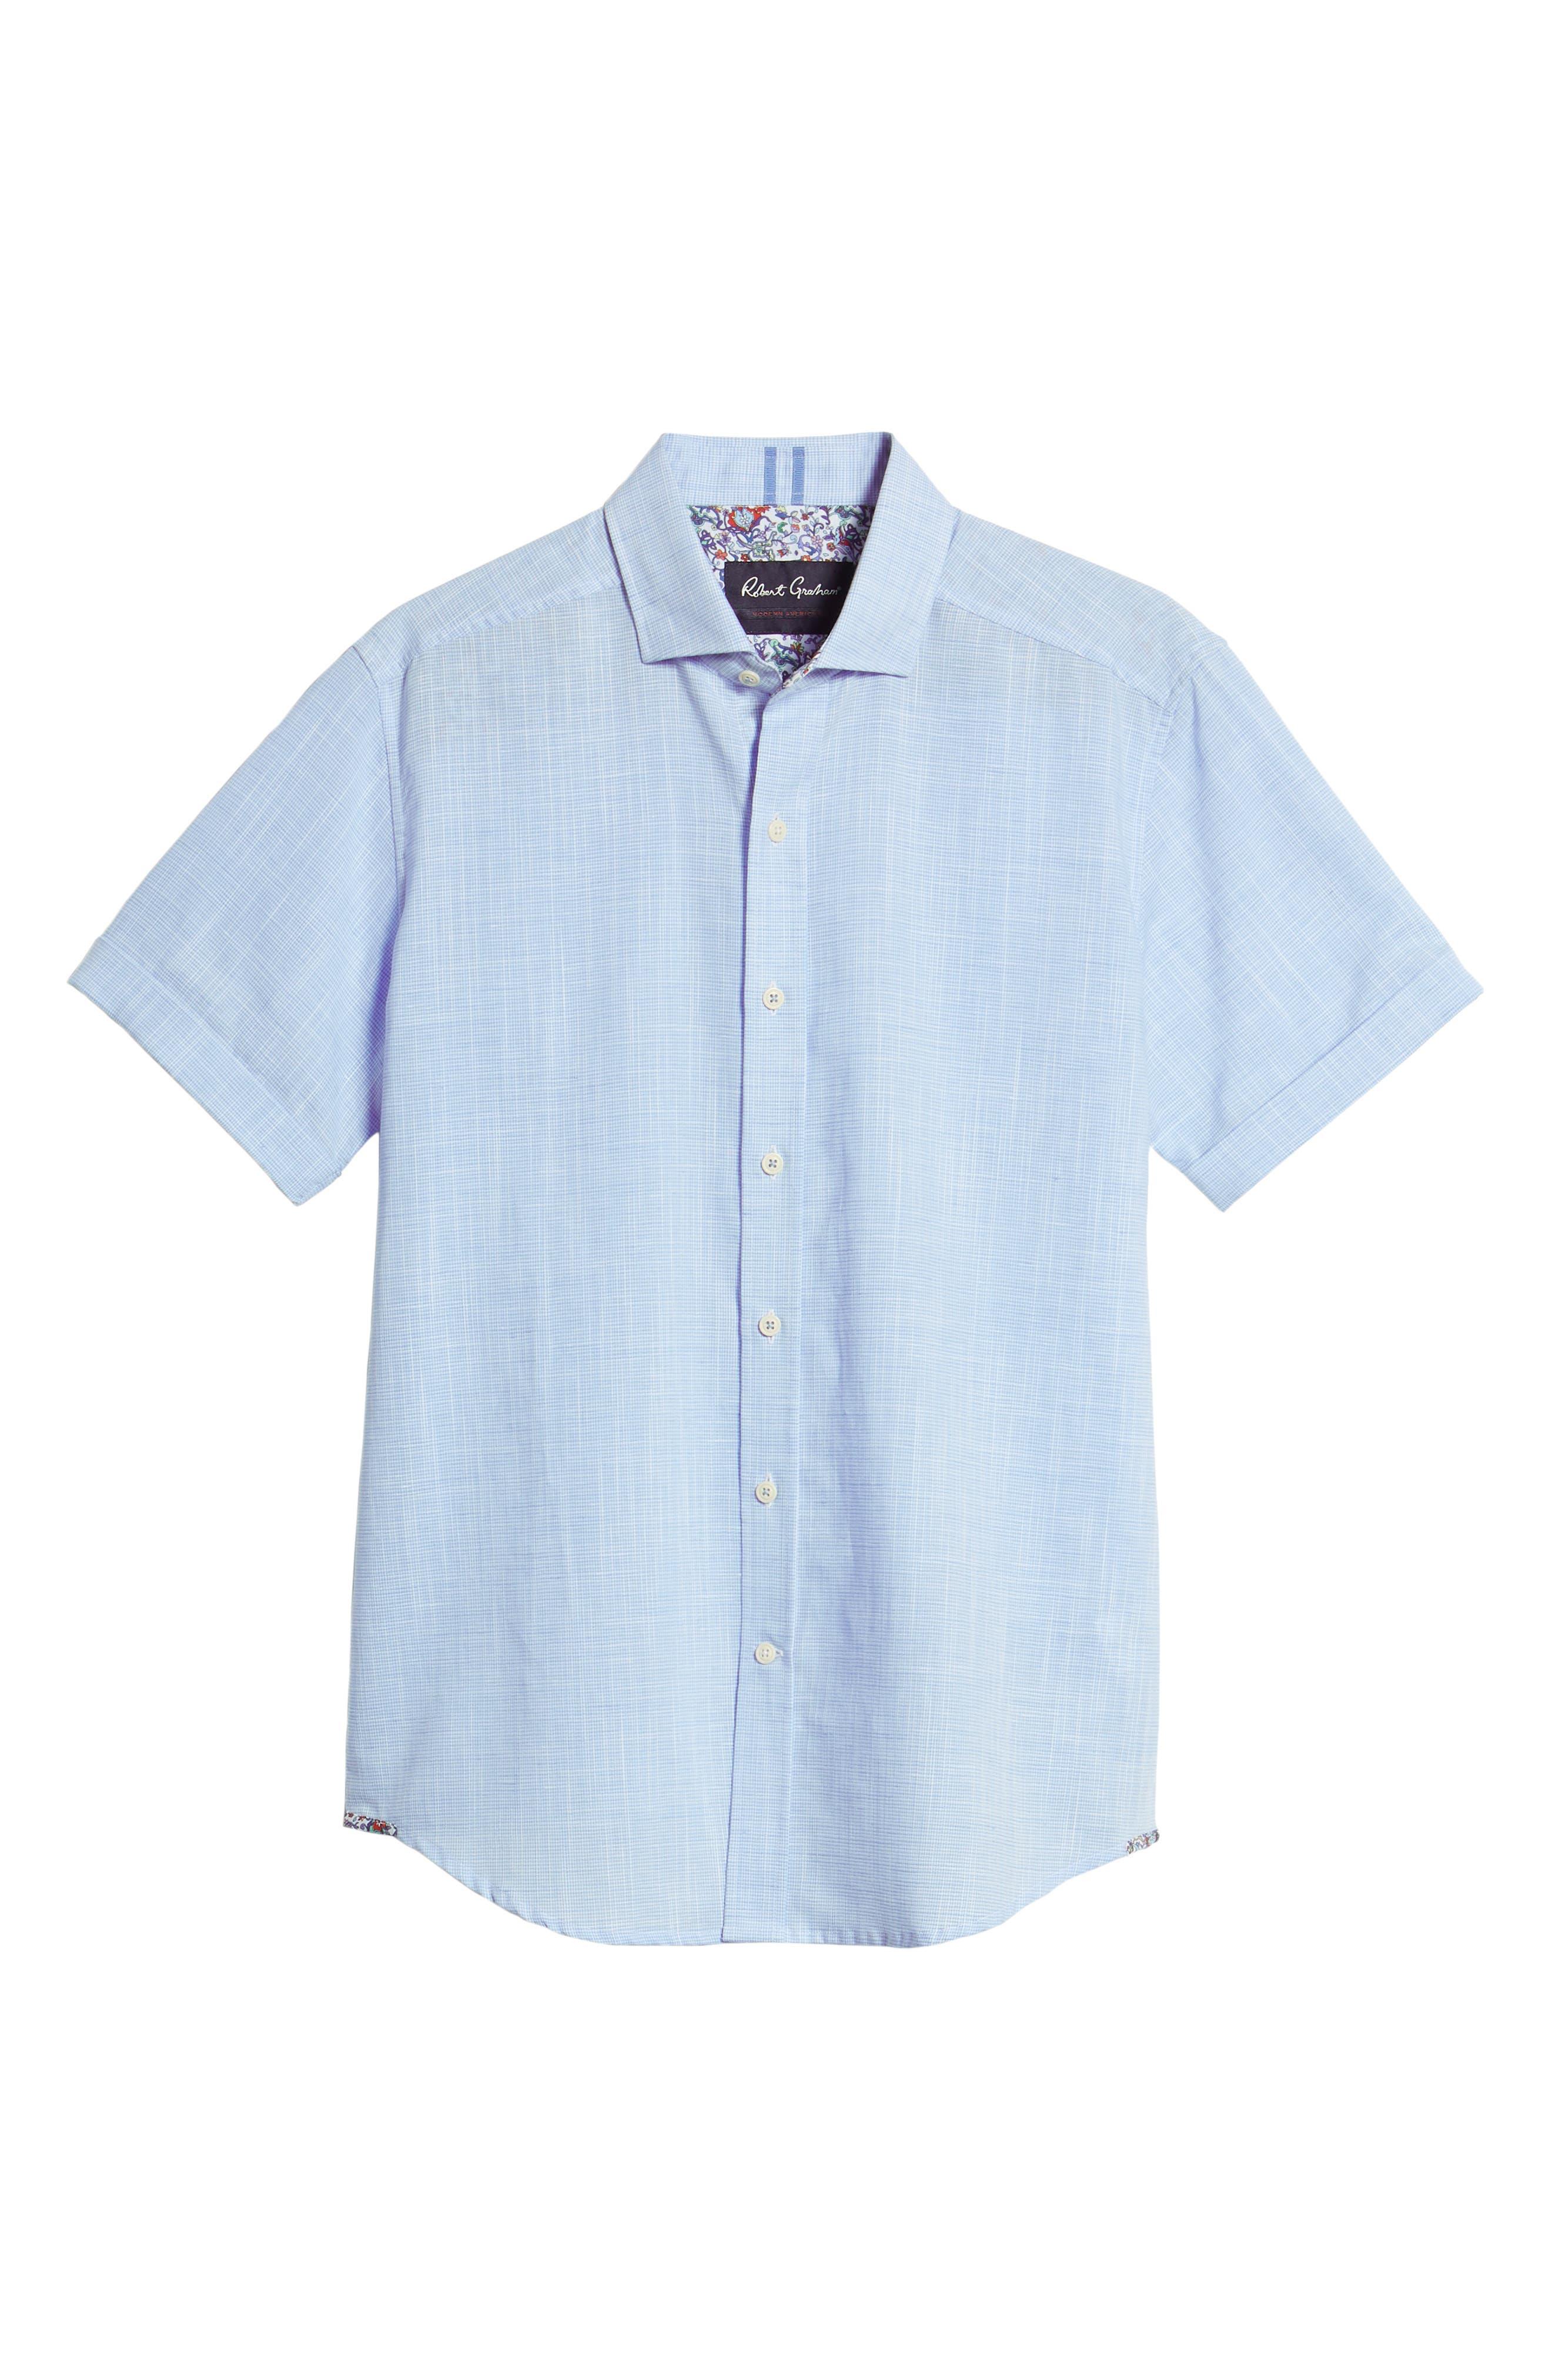 ROBERT GRAHAM,                             Isia Tailored Fit Sport Shirt,                             Alternate thumbnail 6, color,                             400